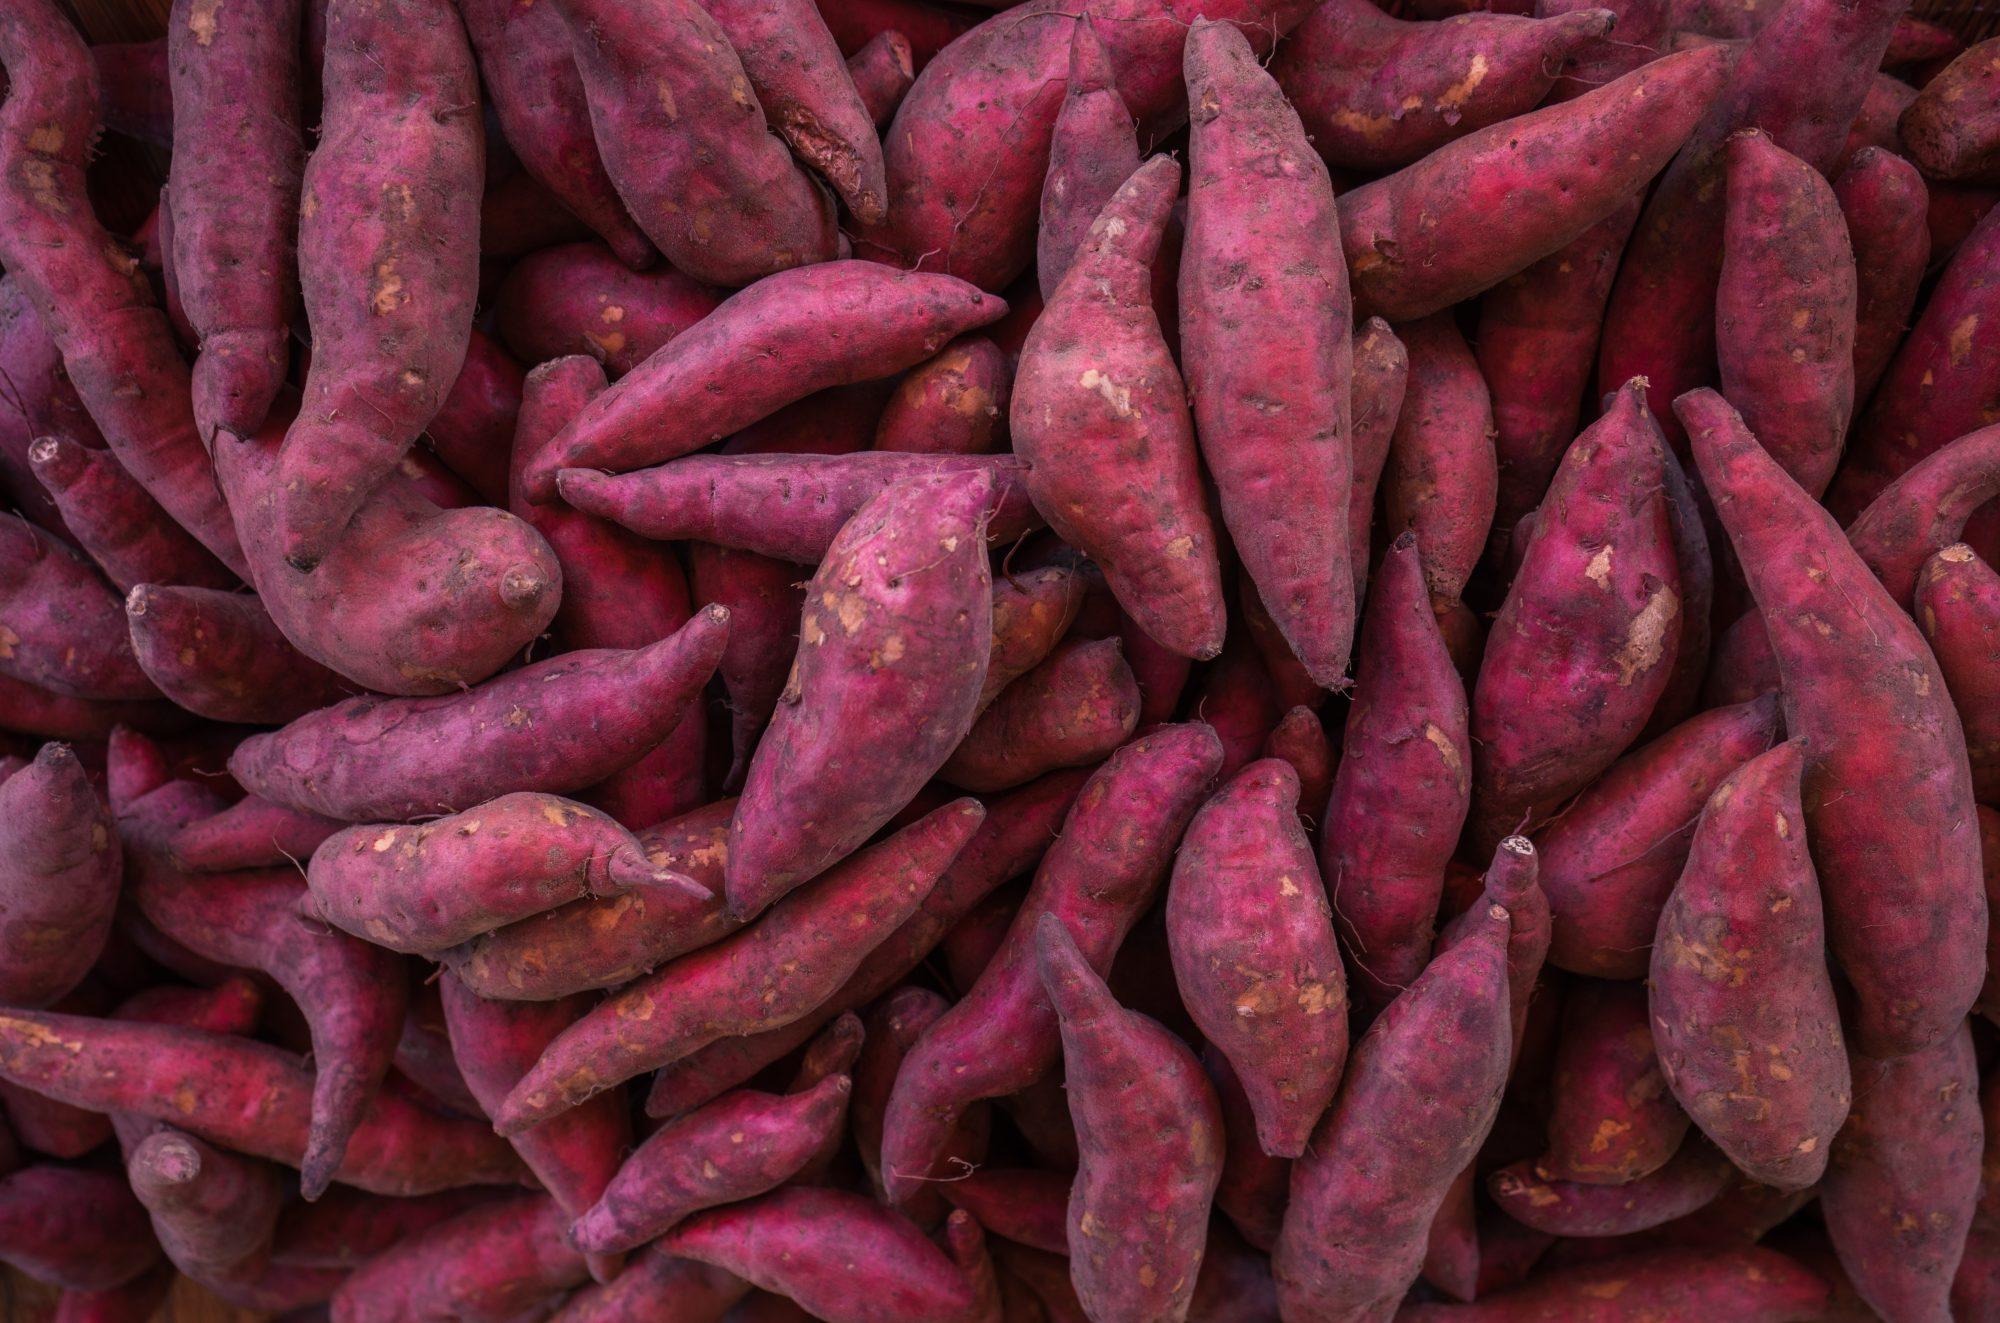 getty sweet potato 112618